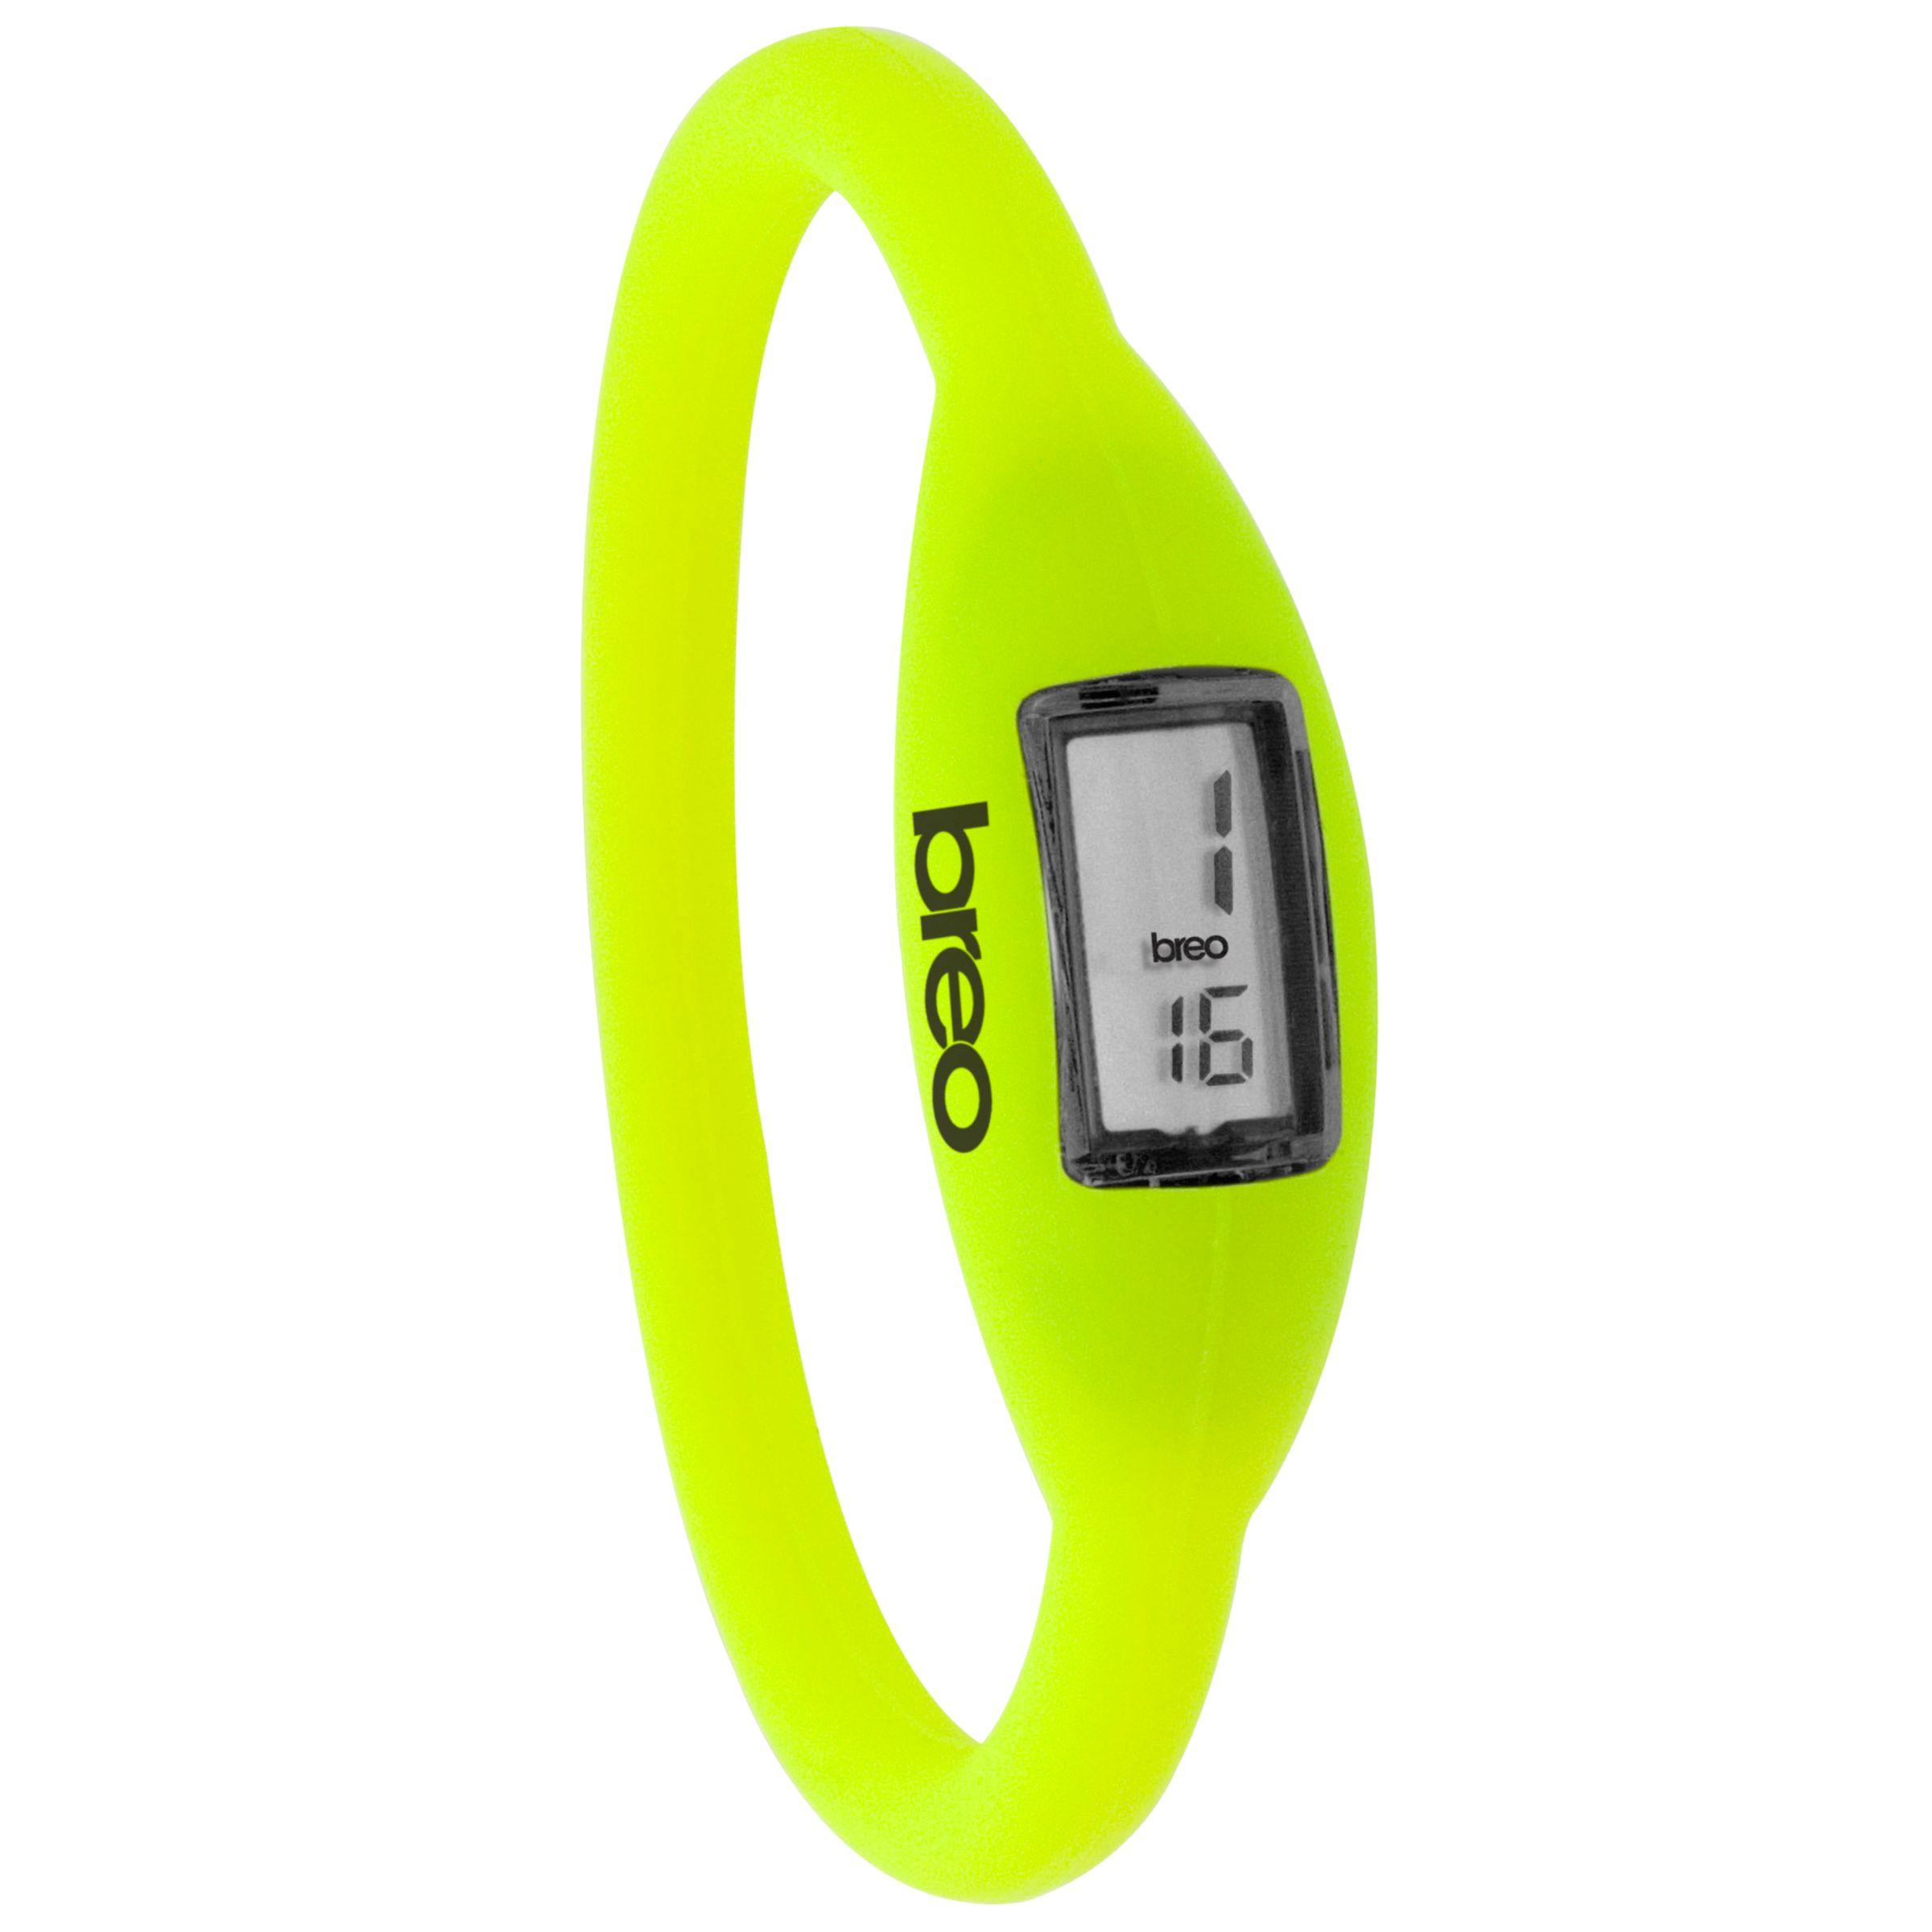 Breo Roam B-TI-NR6 Digital Watch, Fluro Yellow